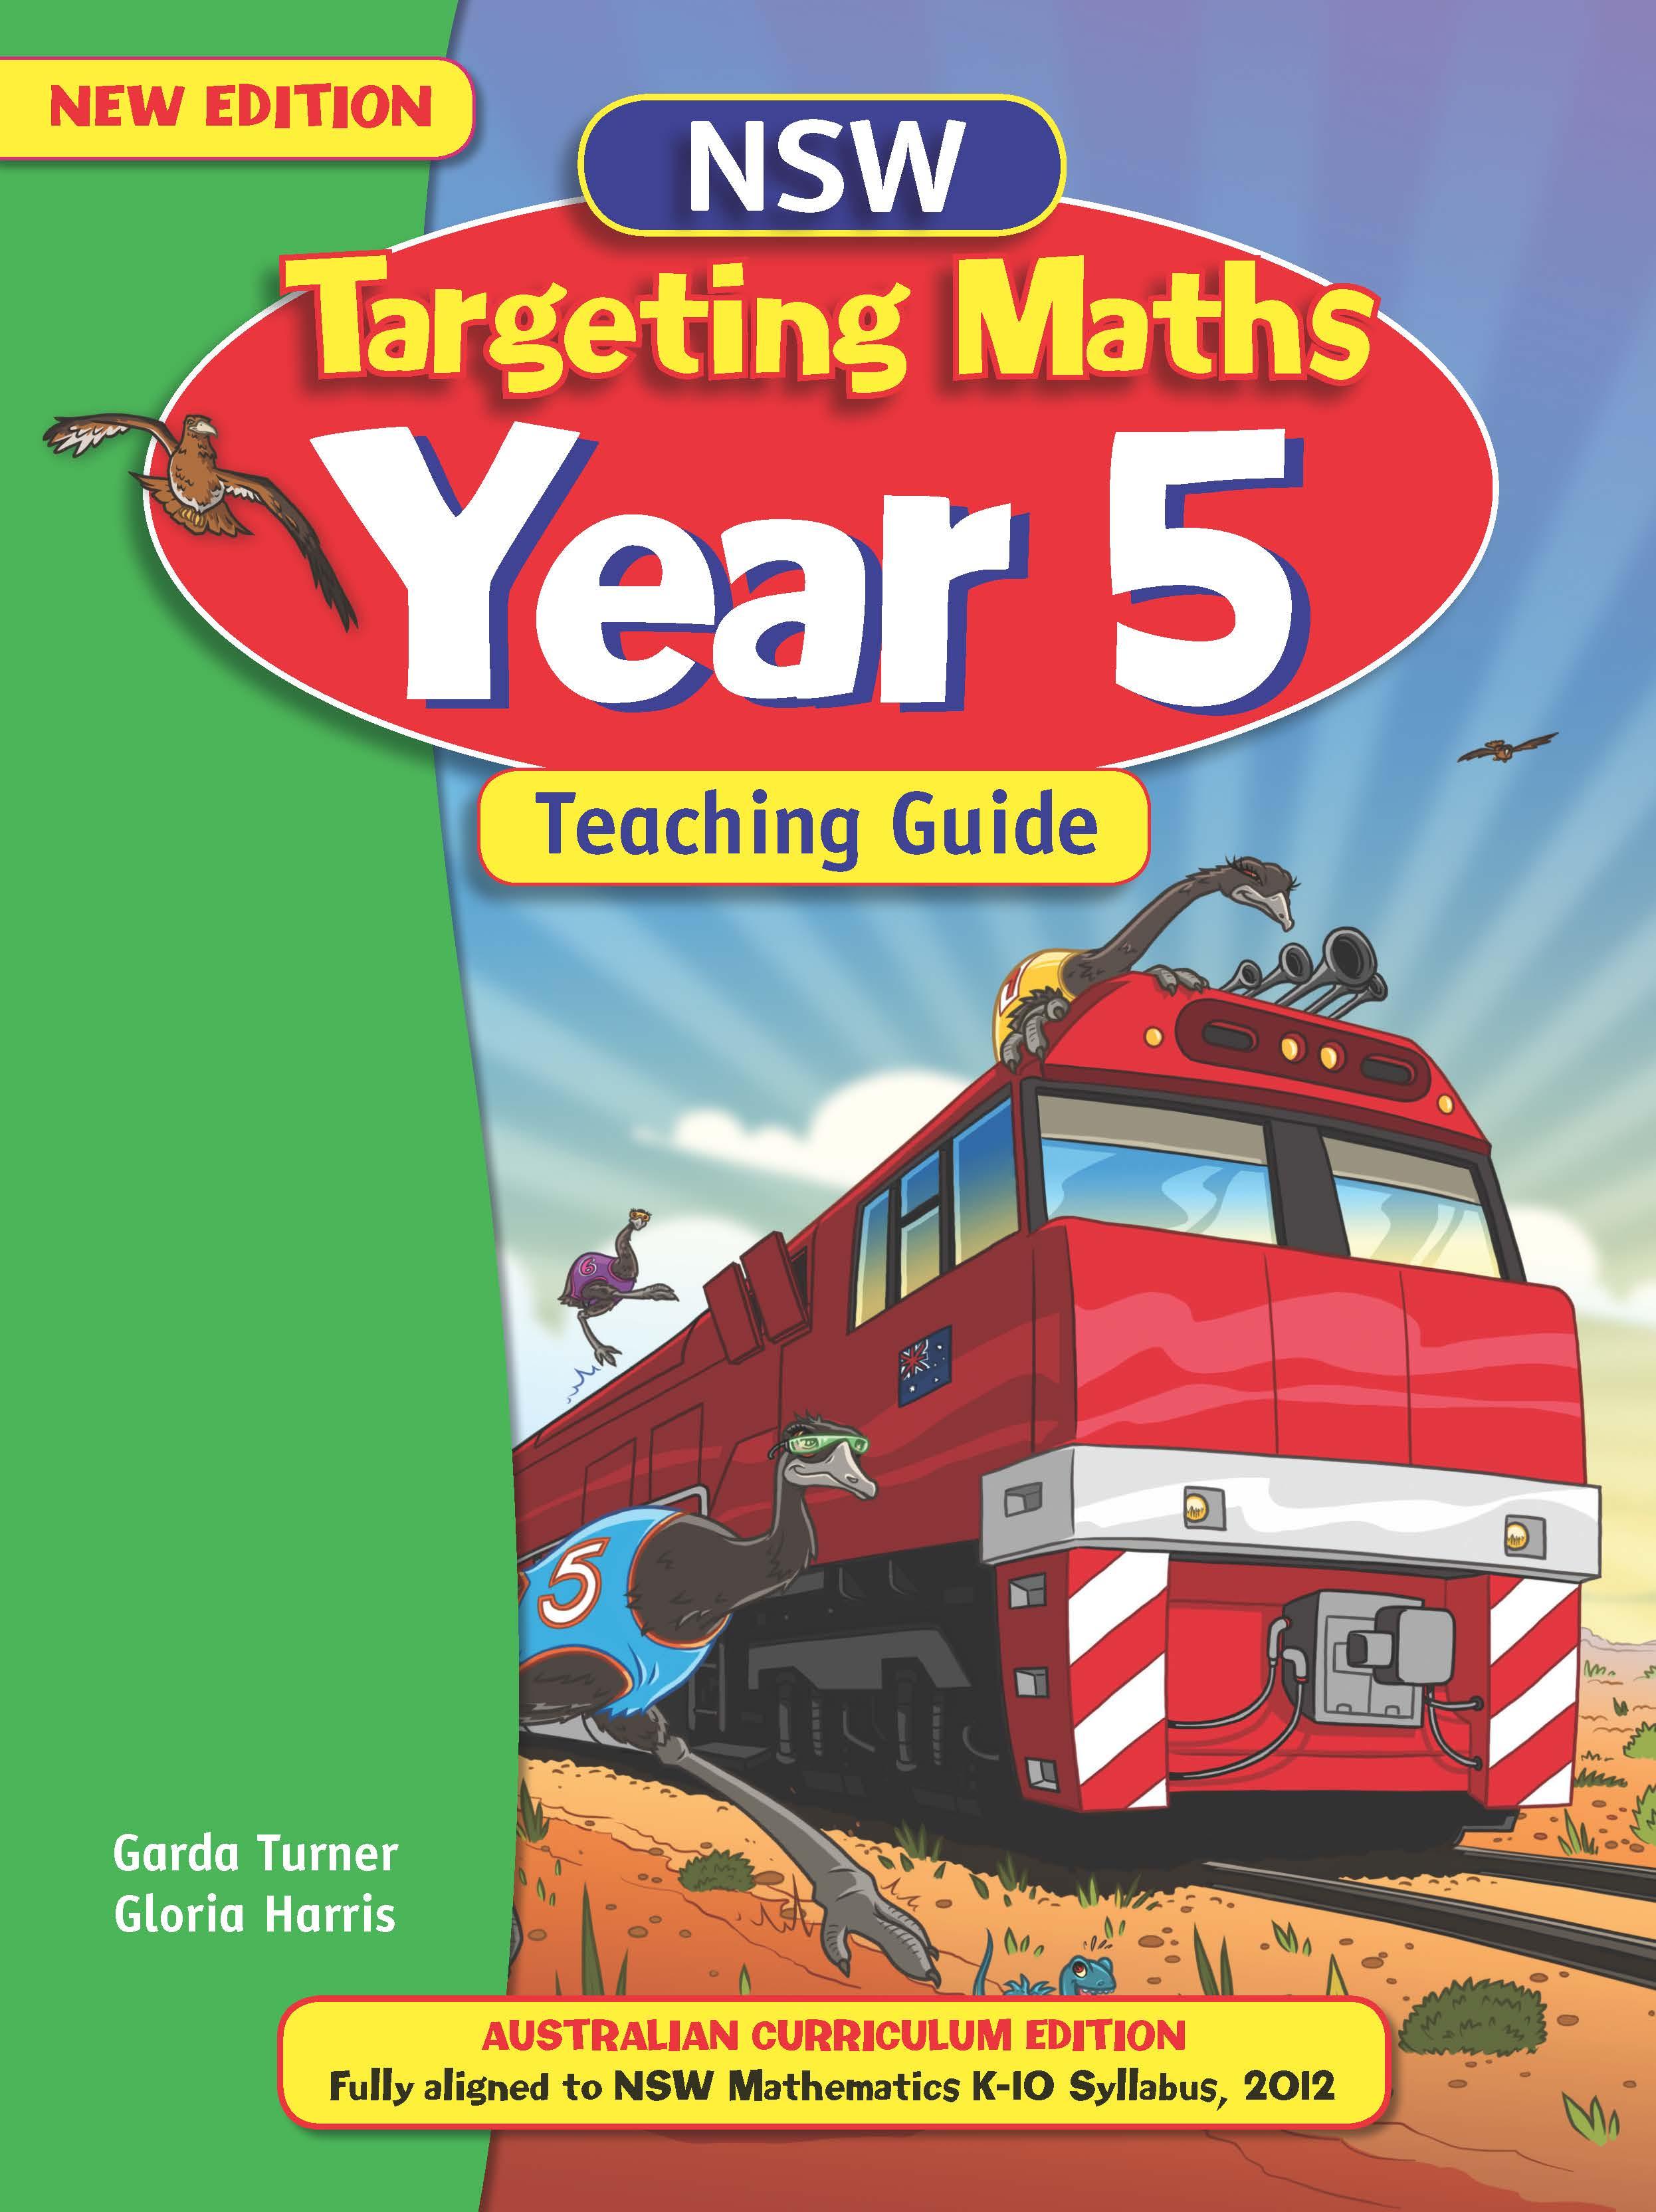 NSW Targeting Maths Australian Curriculum Teaching Guide Year 5